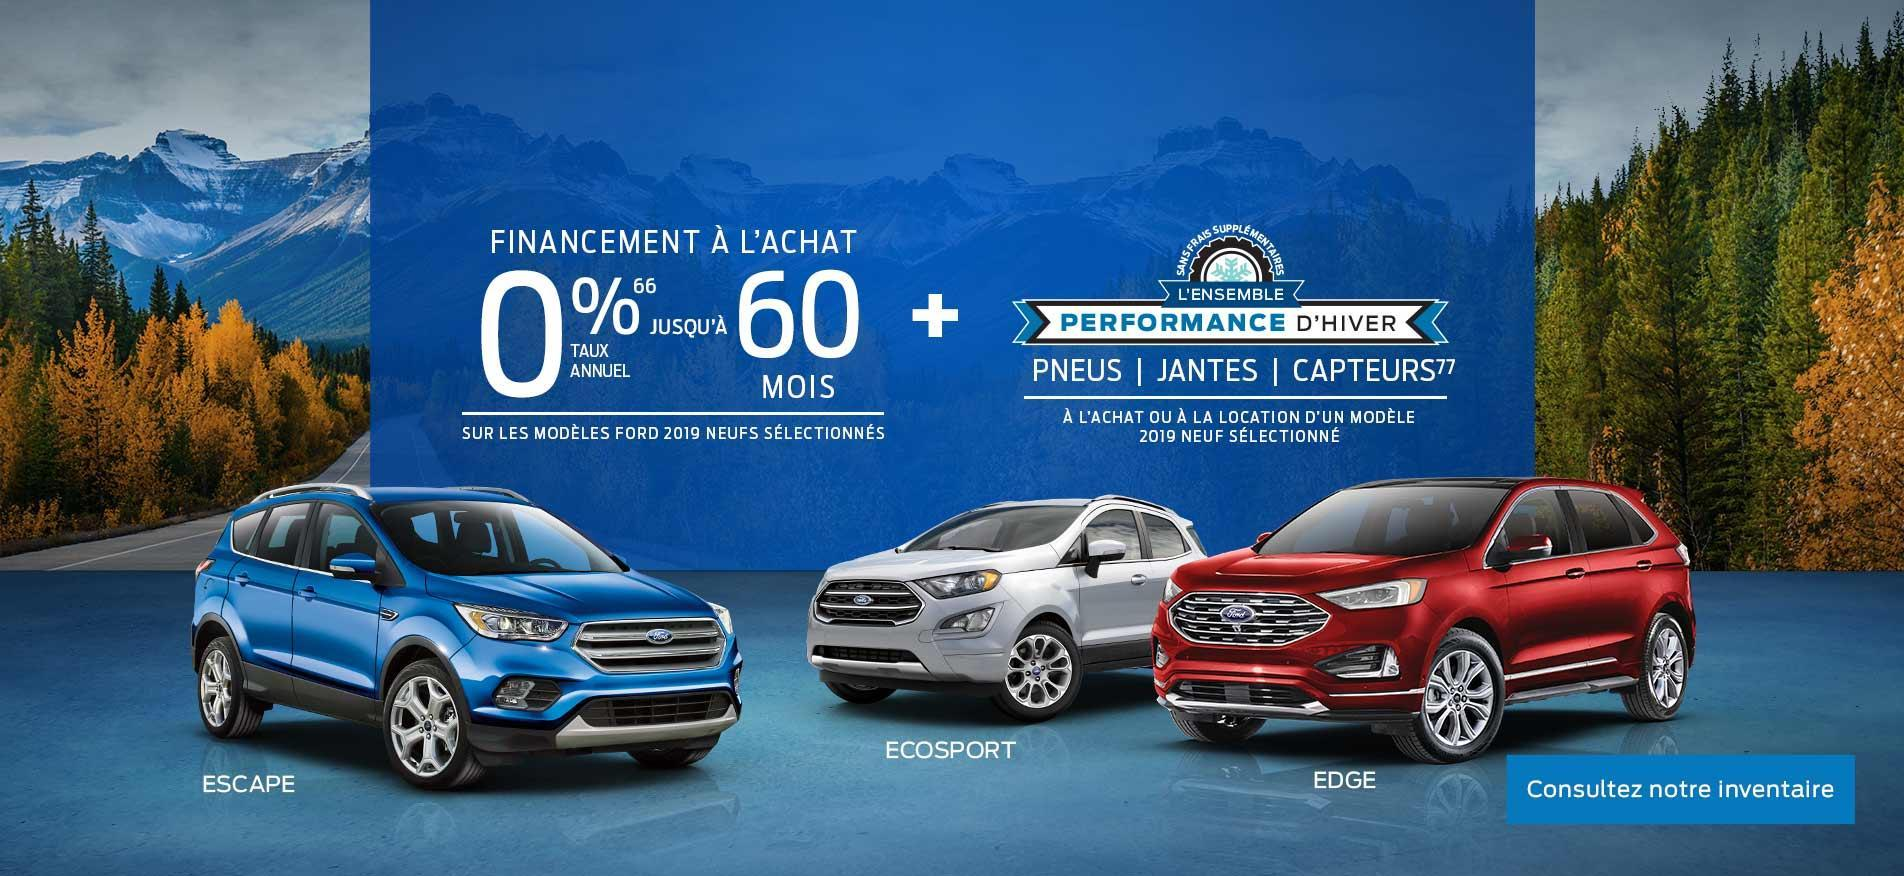 2019 Ford SUVs